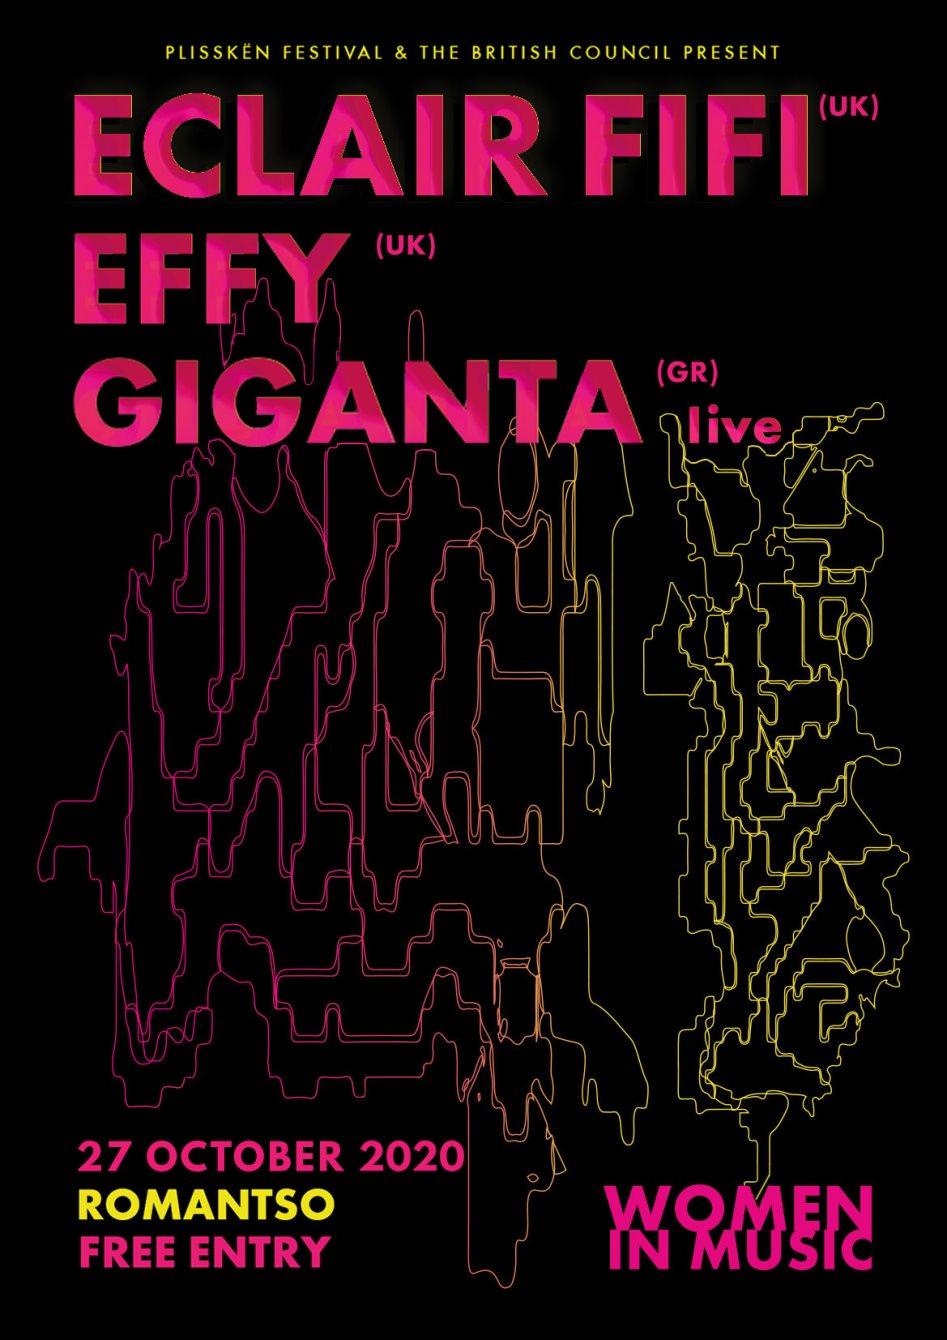 Eclair Fifi & Effy & Giganta - Flyer back